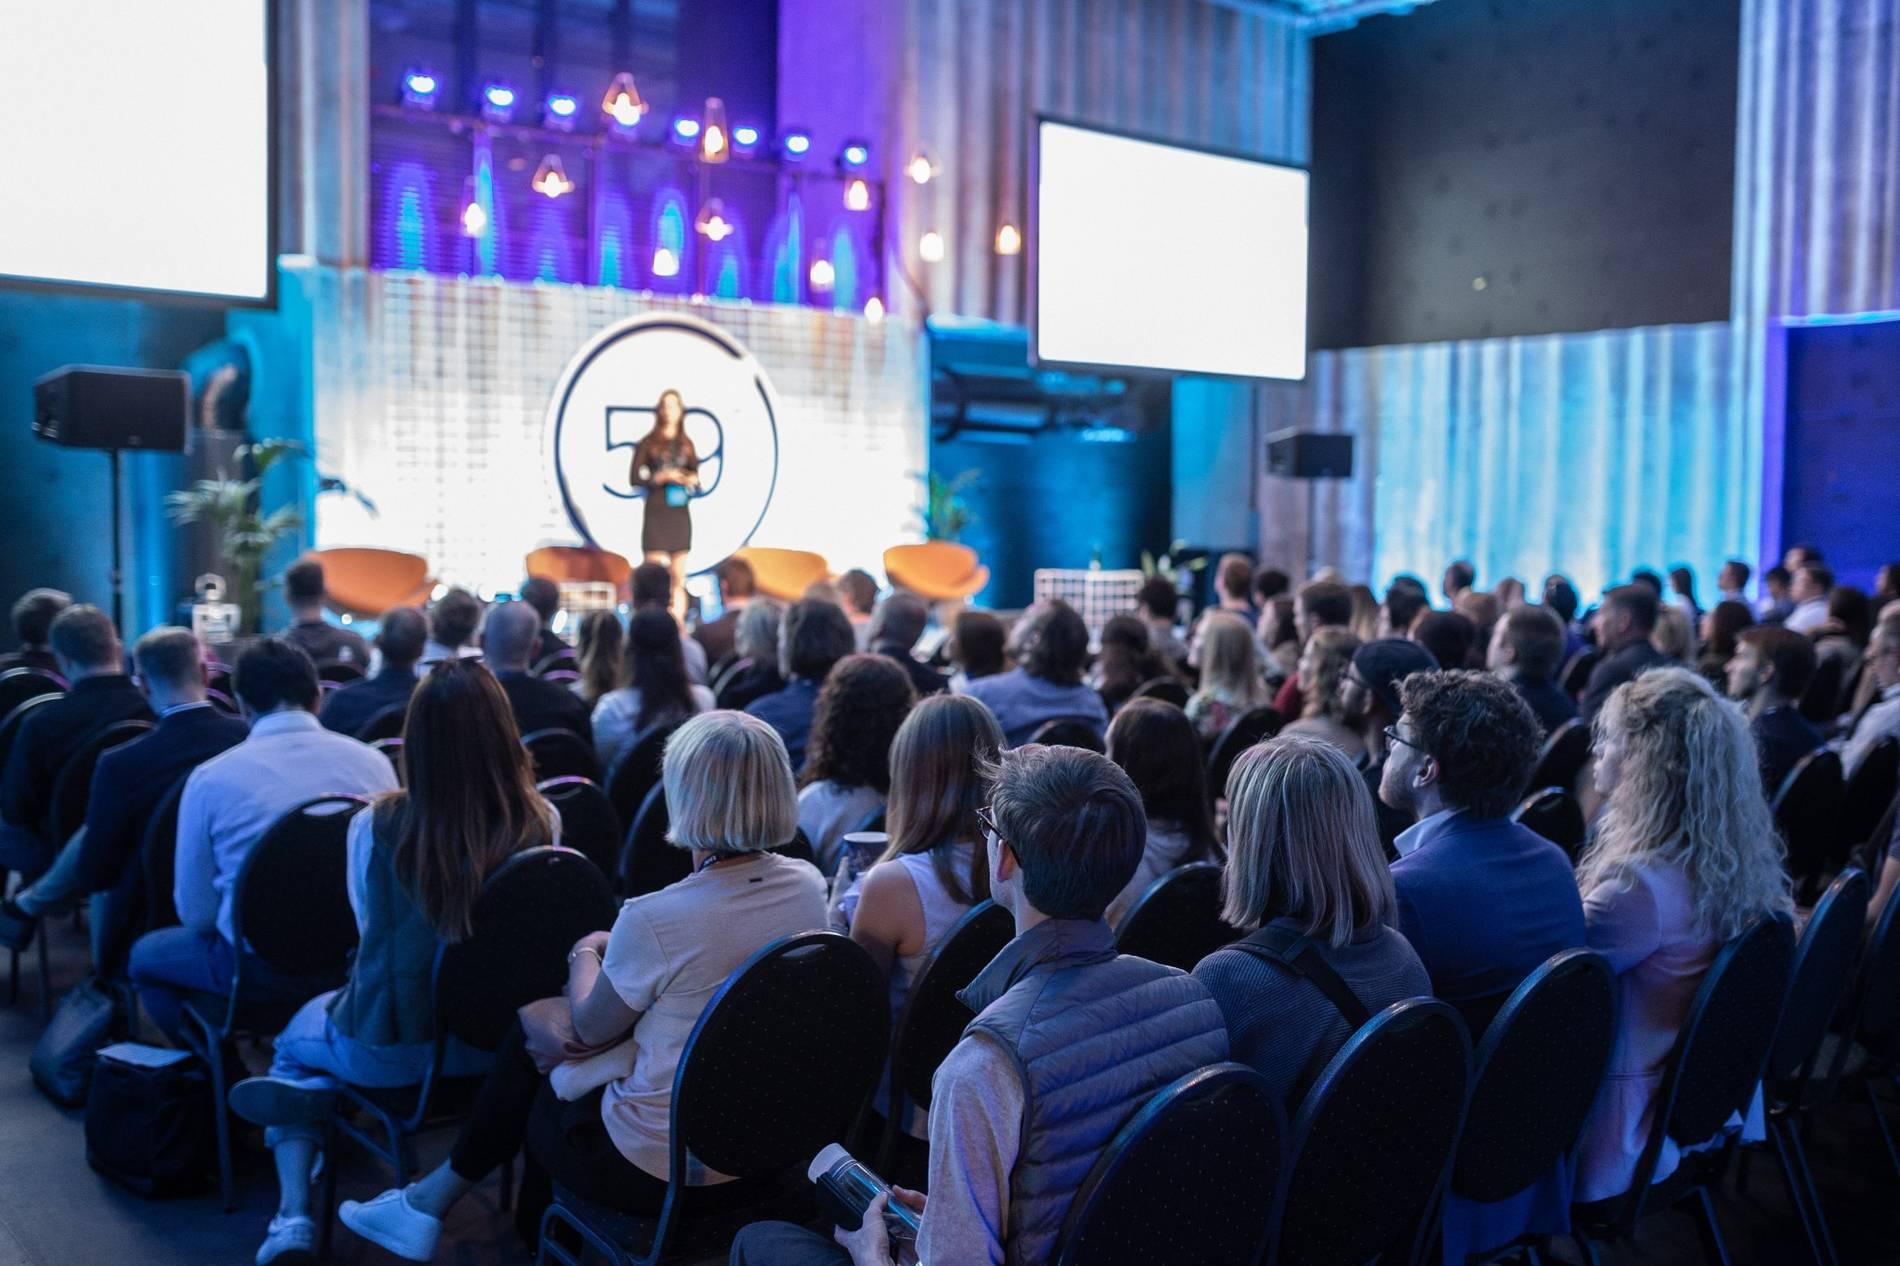 Tallinn growing as a conference destination - News - Tallinn Convention